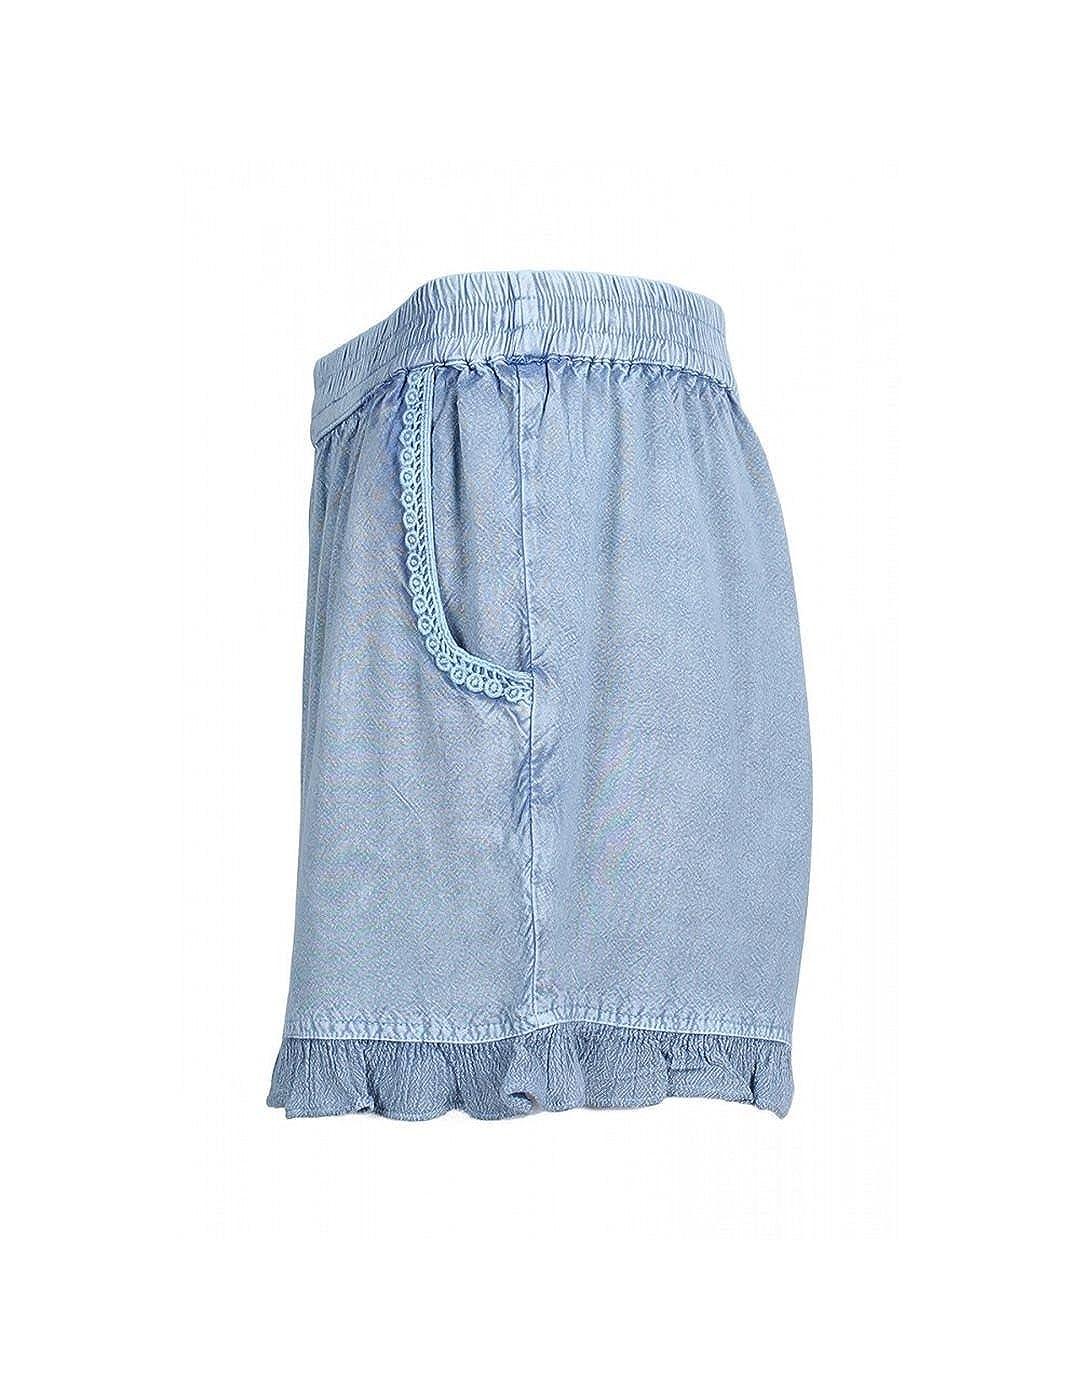 SMF JEANS Short Smf Mujer 188105 Puntilla XL azul: Amazon.es ...